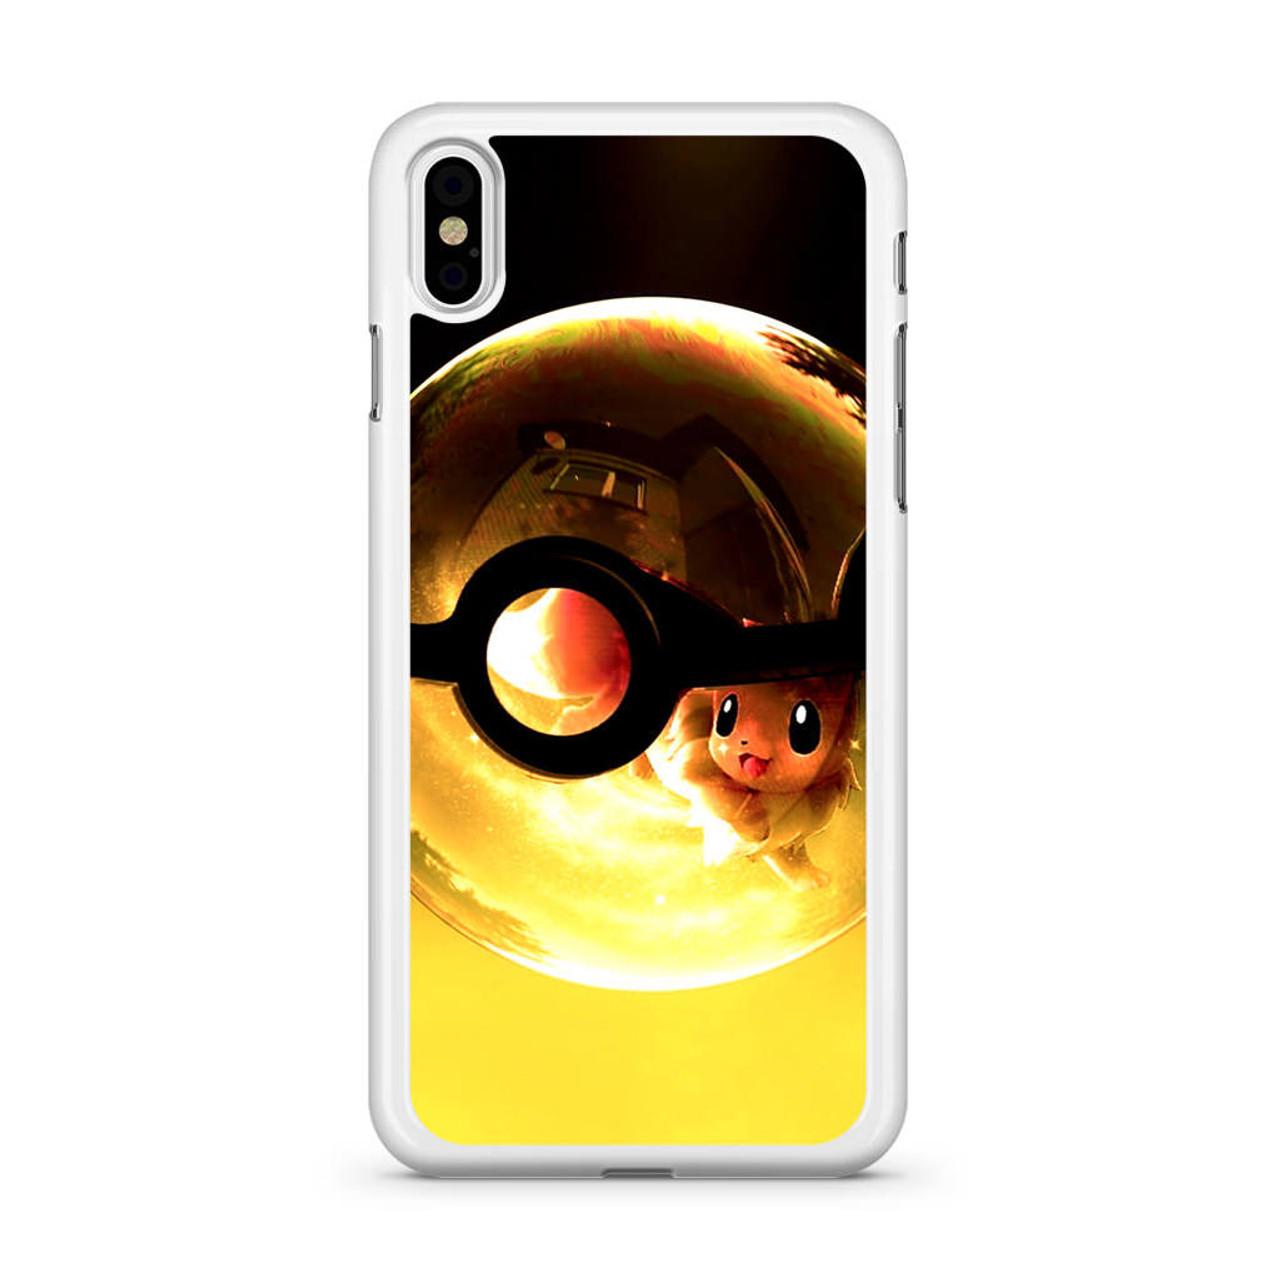 POKEMON PIKACHU ELECTRIC iphone case